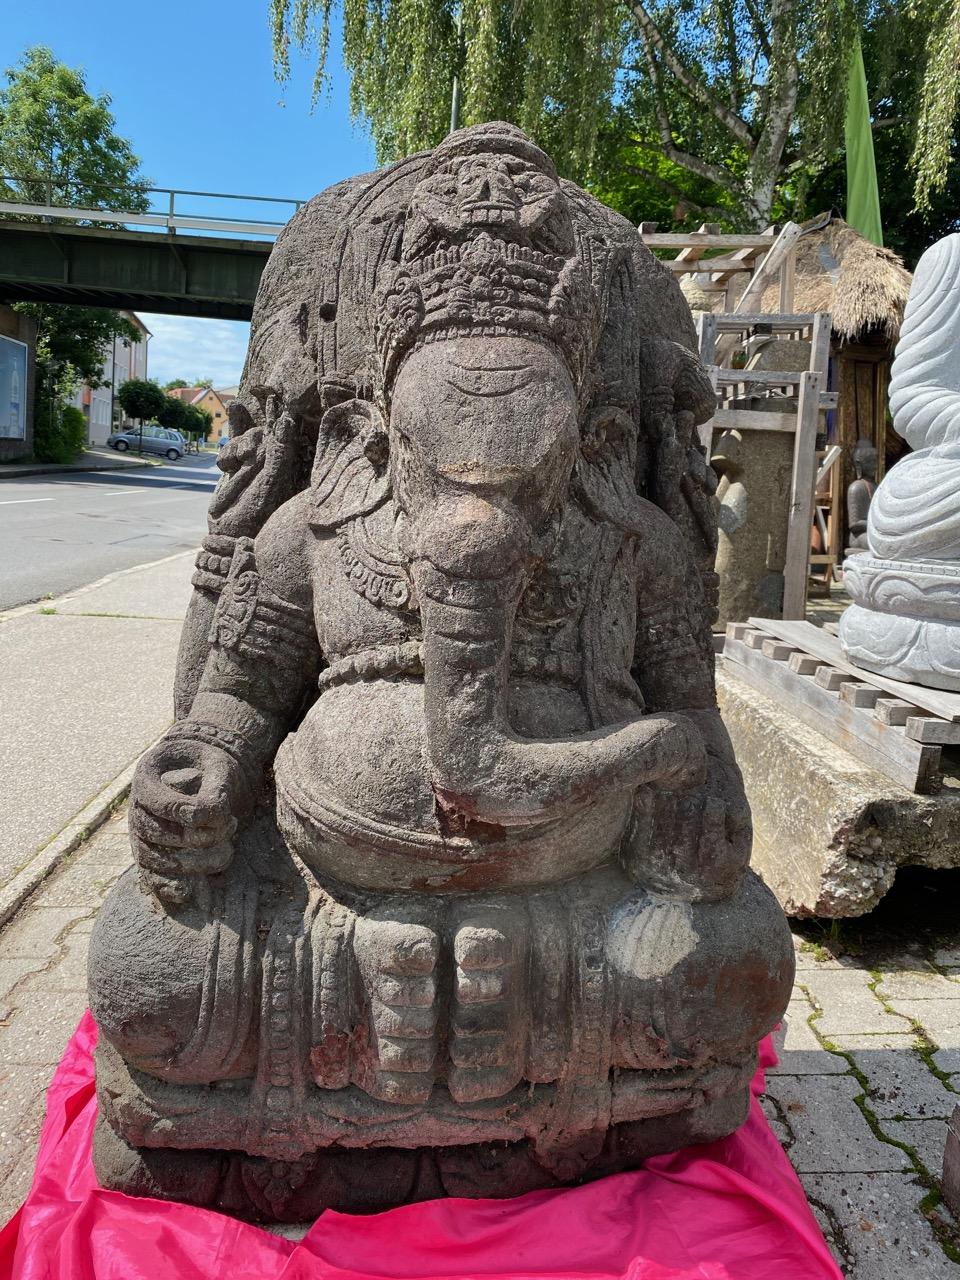 Elefantengott Ganesha Steinfigur